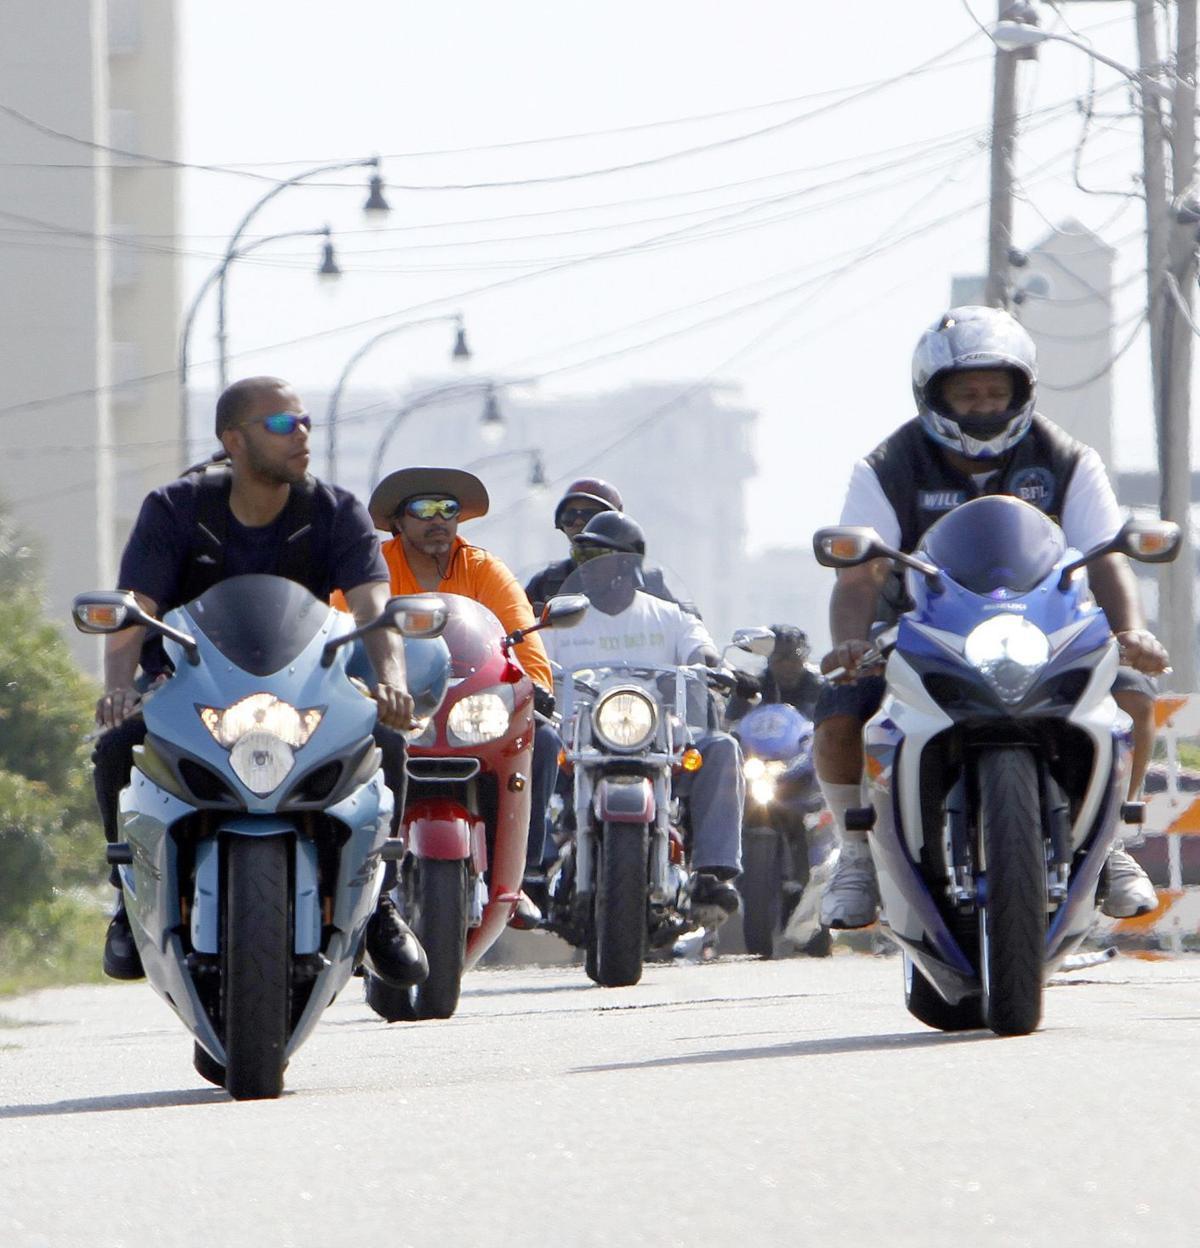 Myrtle Beach officials optimistic about this year's Bikefest (copy) (copy)